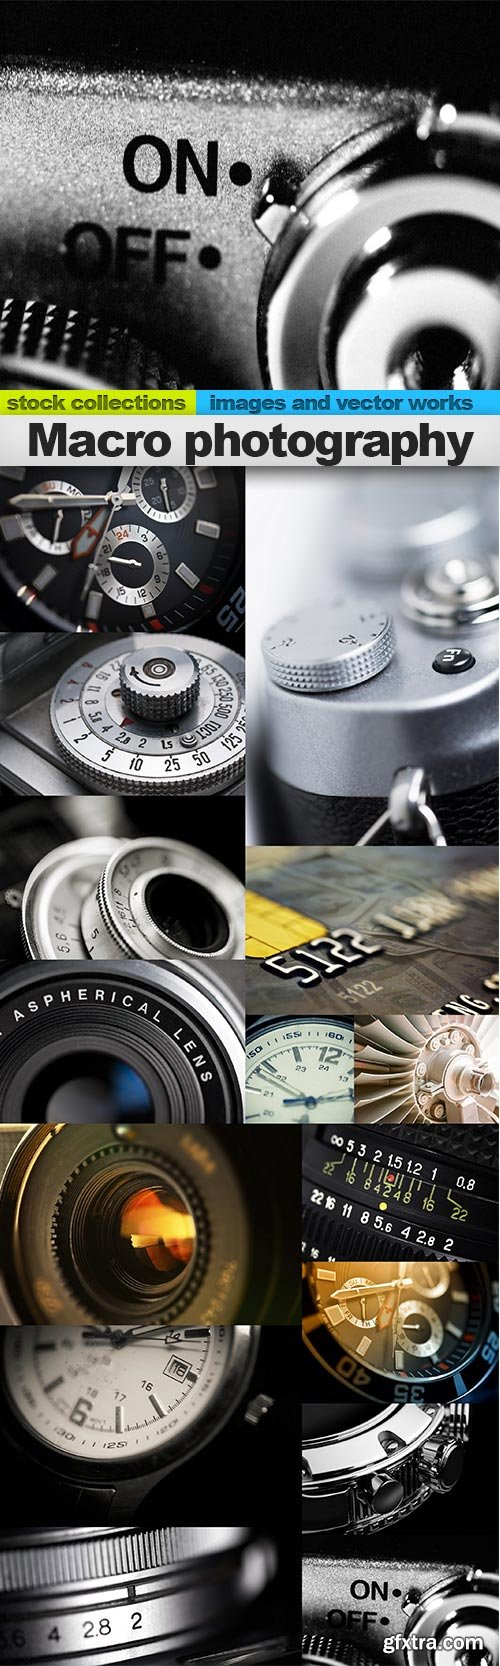 Macro photography, 15 x UHQ JPEG